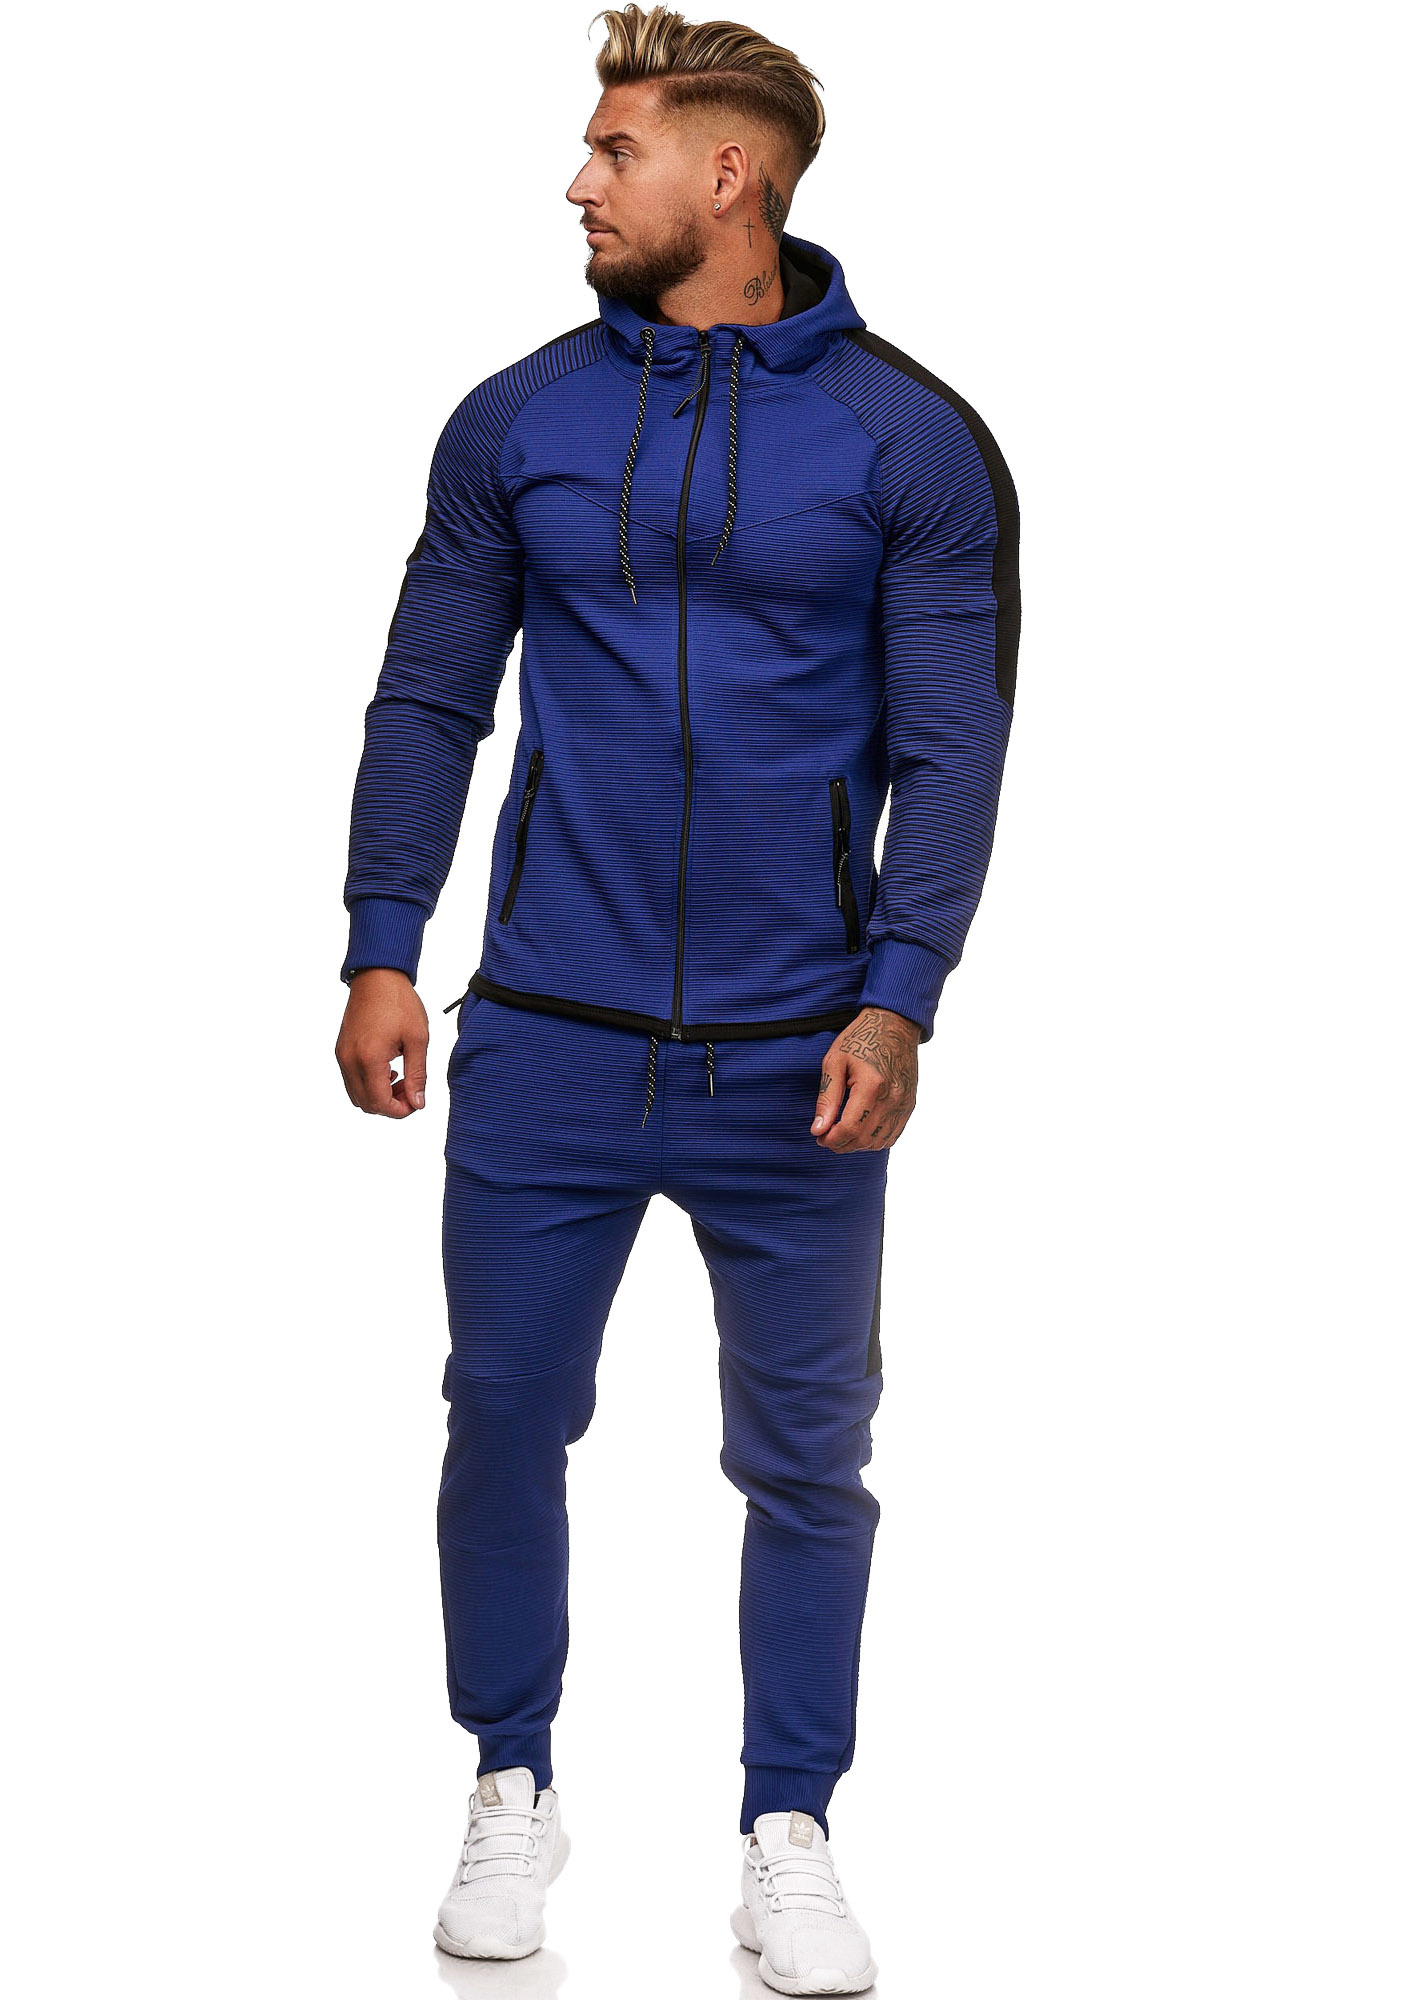 Trainingspak Blauw Zwart Ribbel Slim-Fit